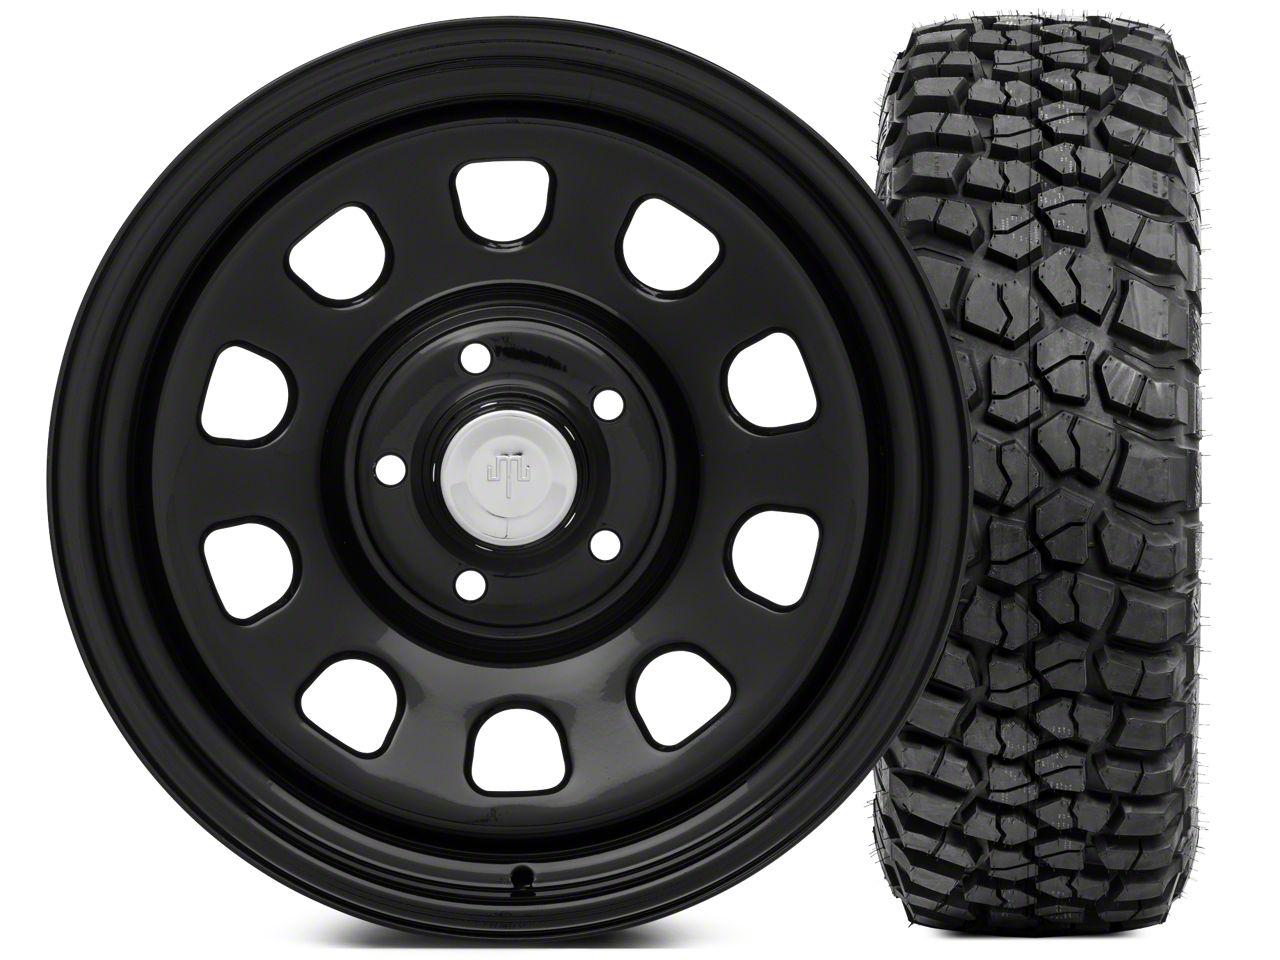 Mammoth D Window Steel 17x9 Wheel and BFG KM2 Tire 305/70 - 17 Tire Kit (07-18 Jeep Wrangler JK)